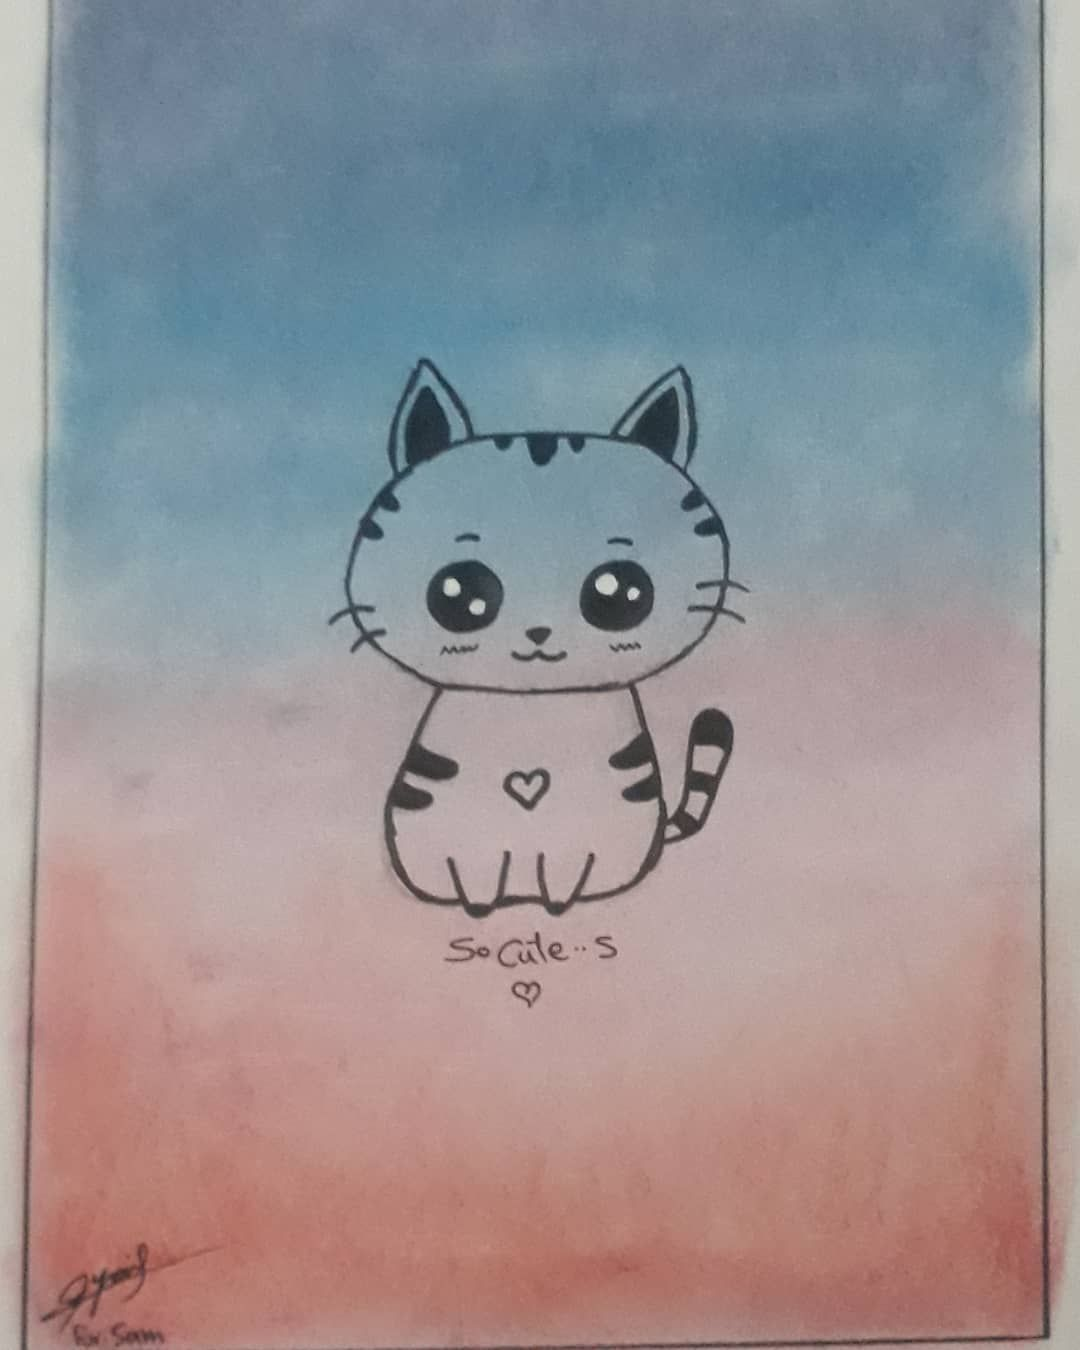 Sometimes We Need To Smile To Some Cute Things Maro Skandar هالصورة اهداء للبيست فرند Behappy H Kitty Hello Kitty Character